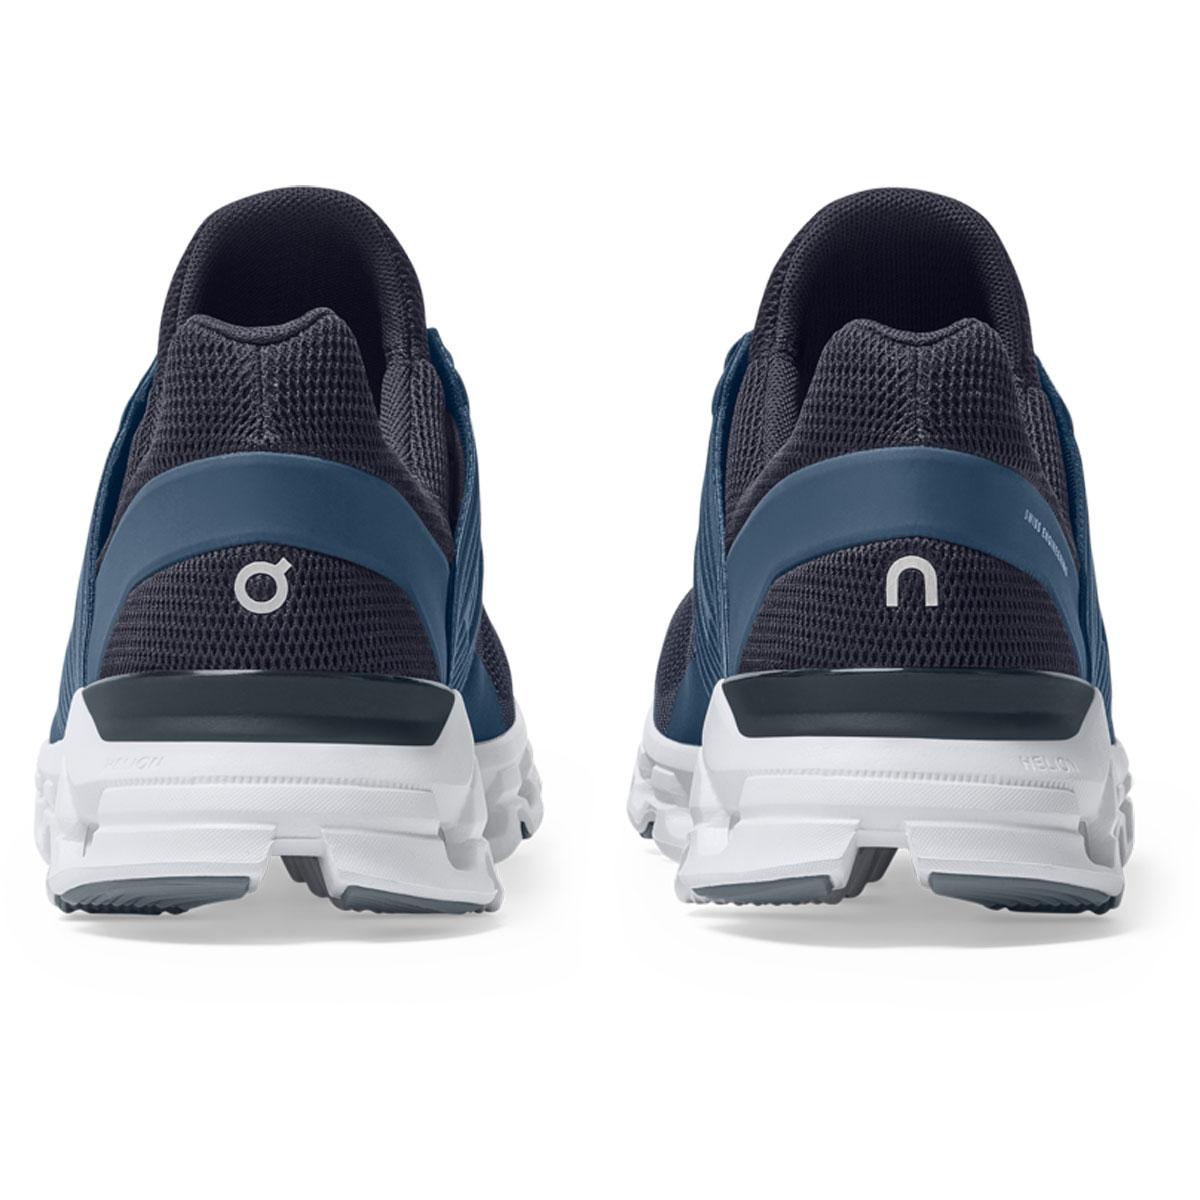 Men's On Cloudswift 2.0 Running Shoe - Color: Denim/Midnight - Size: 7 - Width: Regular, Denim/Midnight, large, image 4